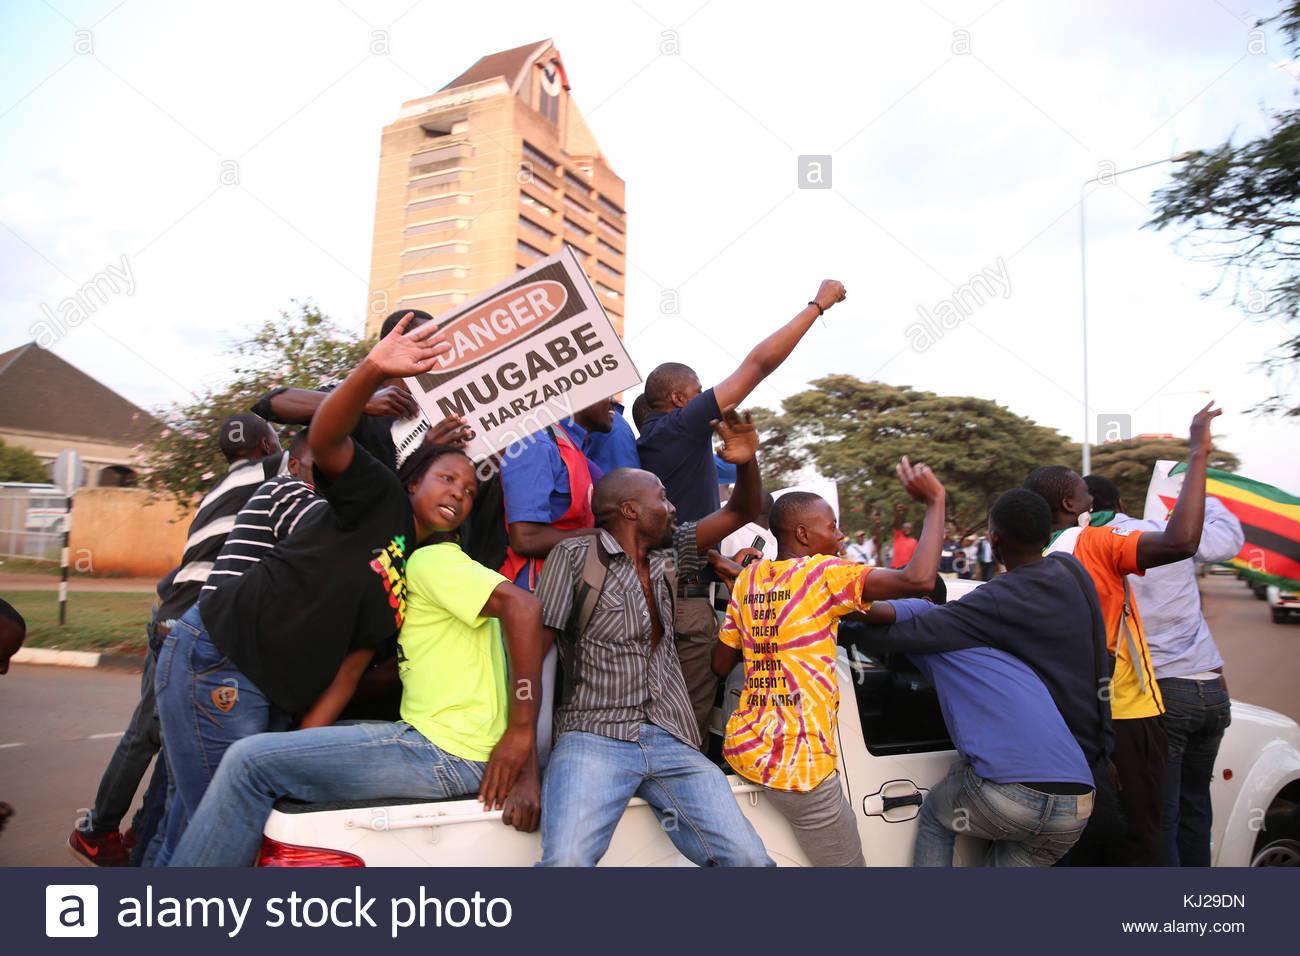 Harare, Zimbabwe. 21st Nov, 2017. Residents of Harare, Zimbabwe take to the streets on November 21, 2017 to celebrate - Stock Image